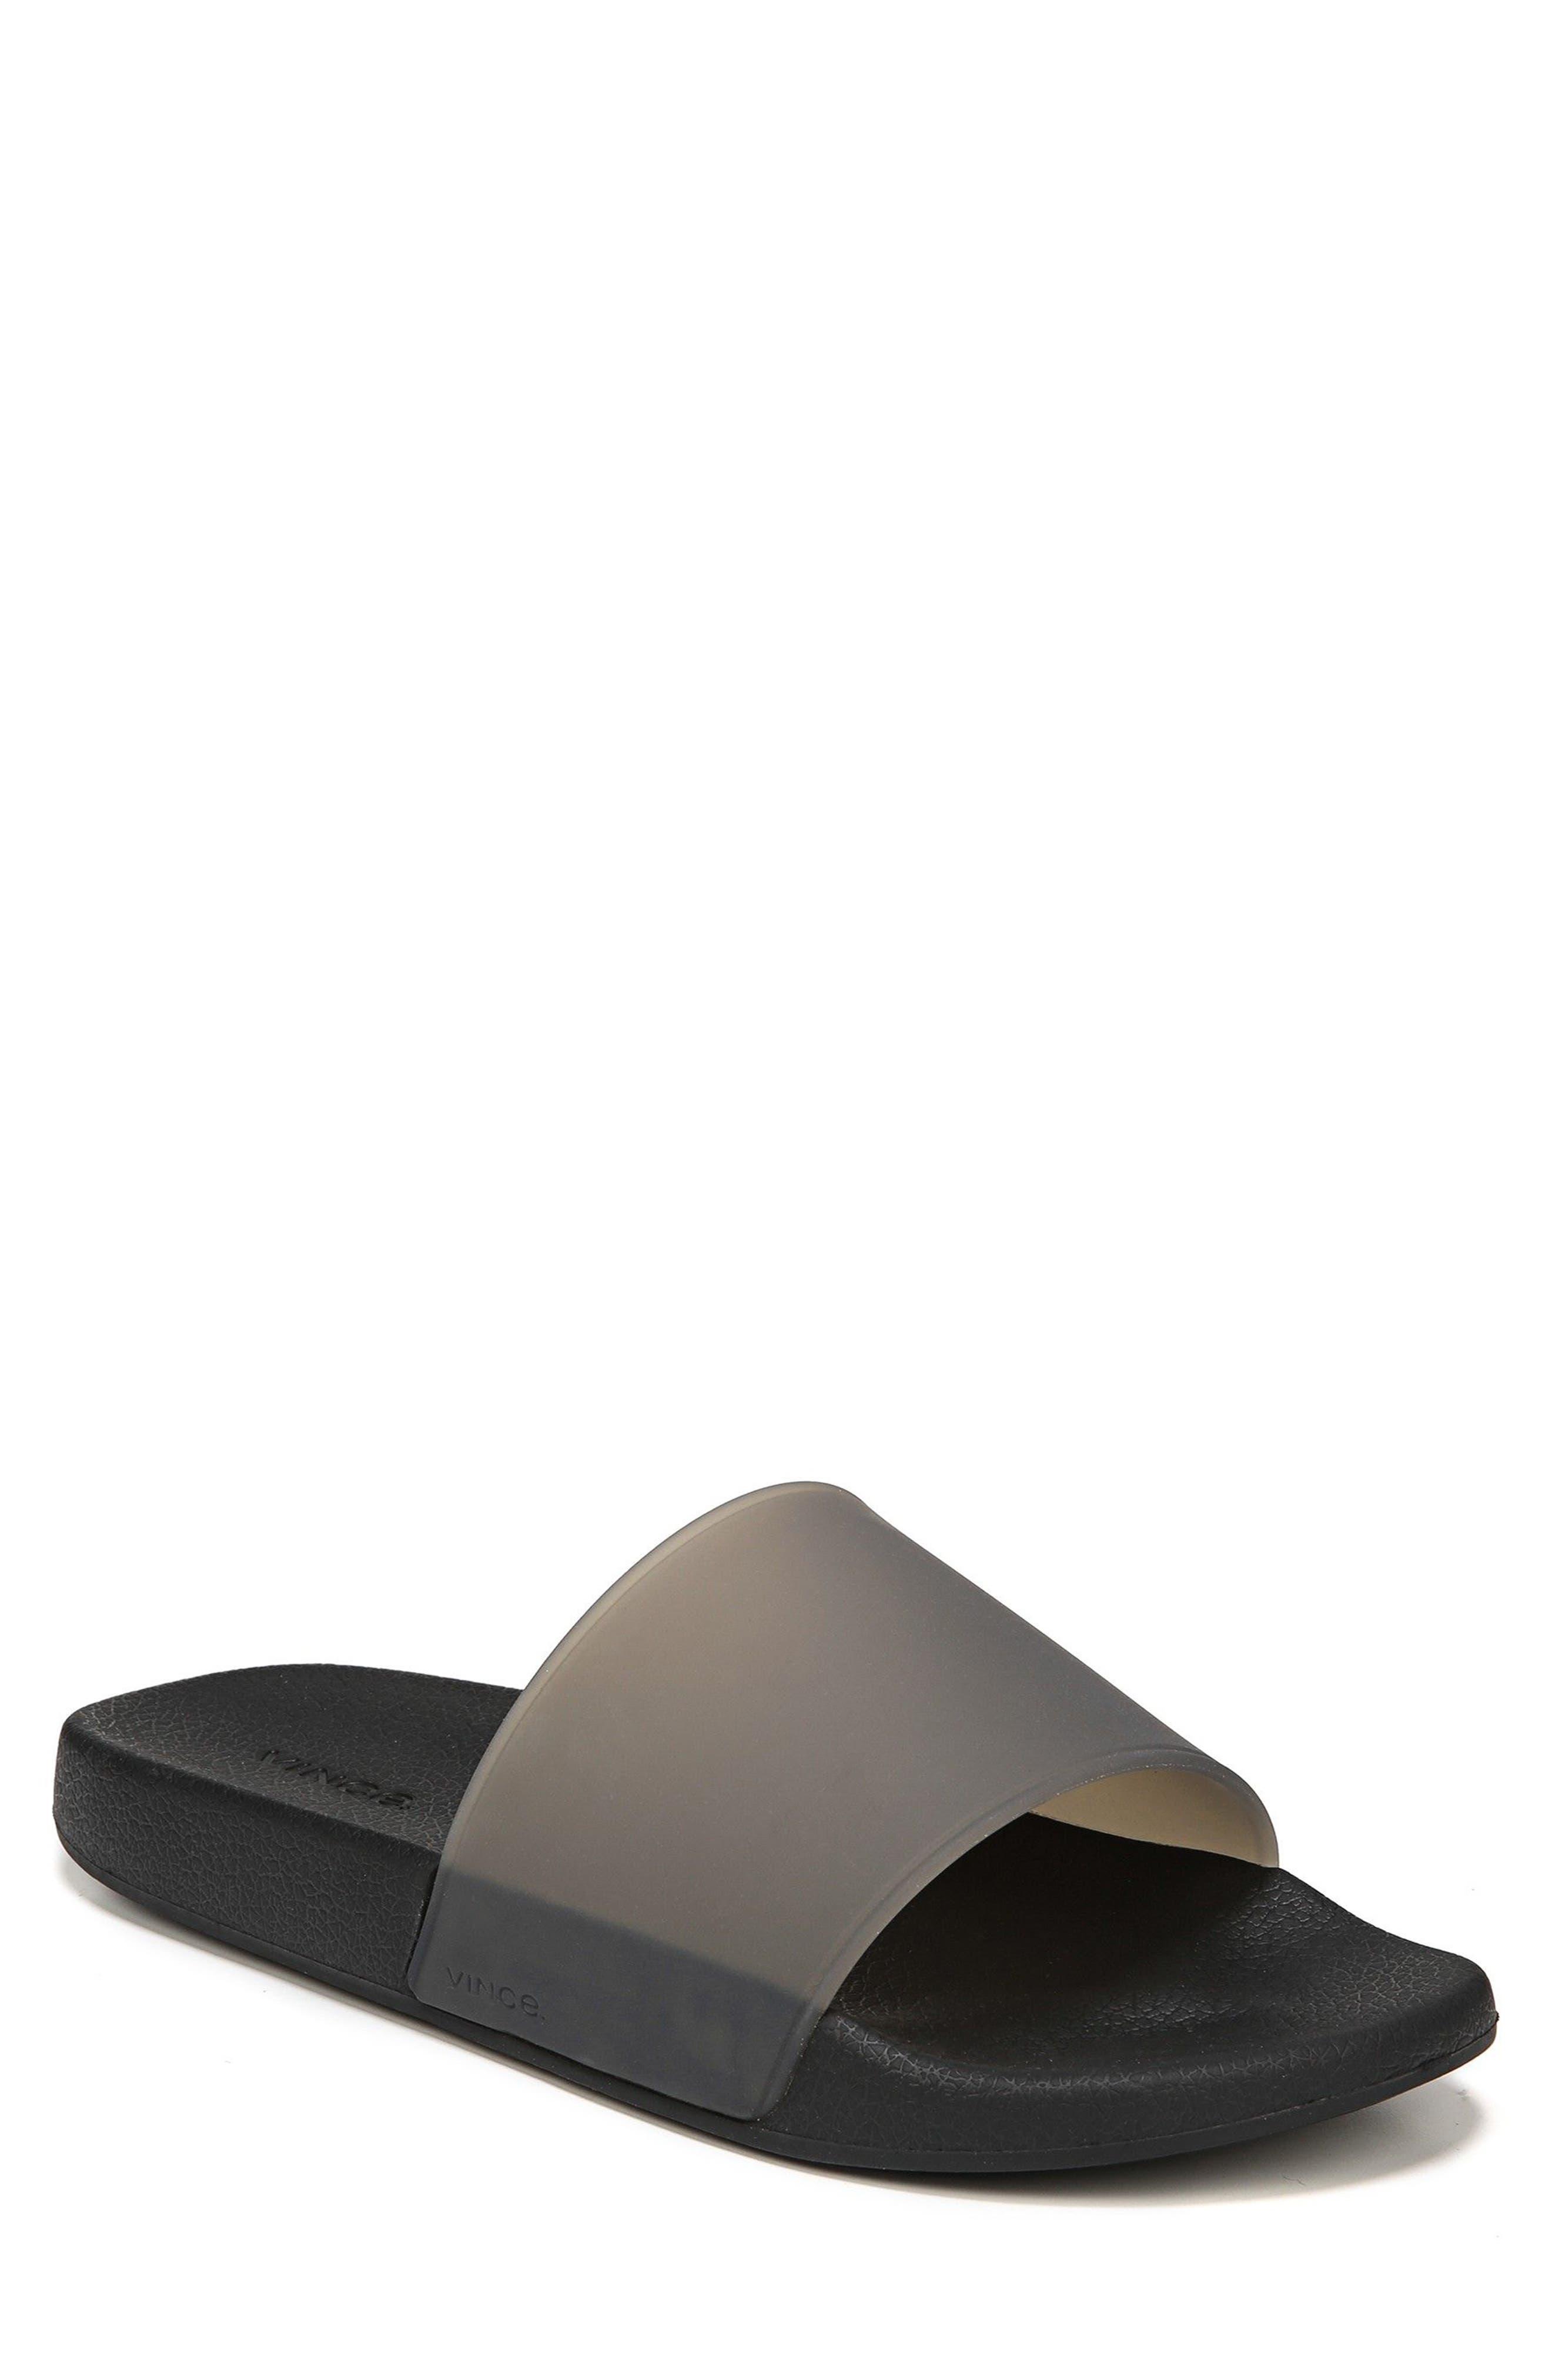 Westcoast Sport Sandal,                         Main,                         color, 093